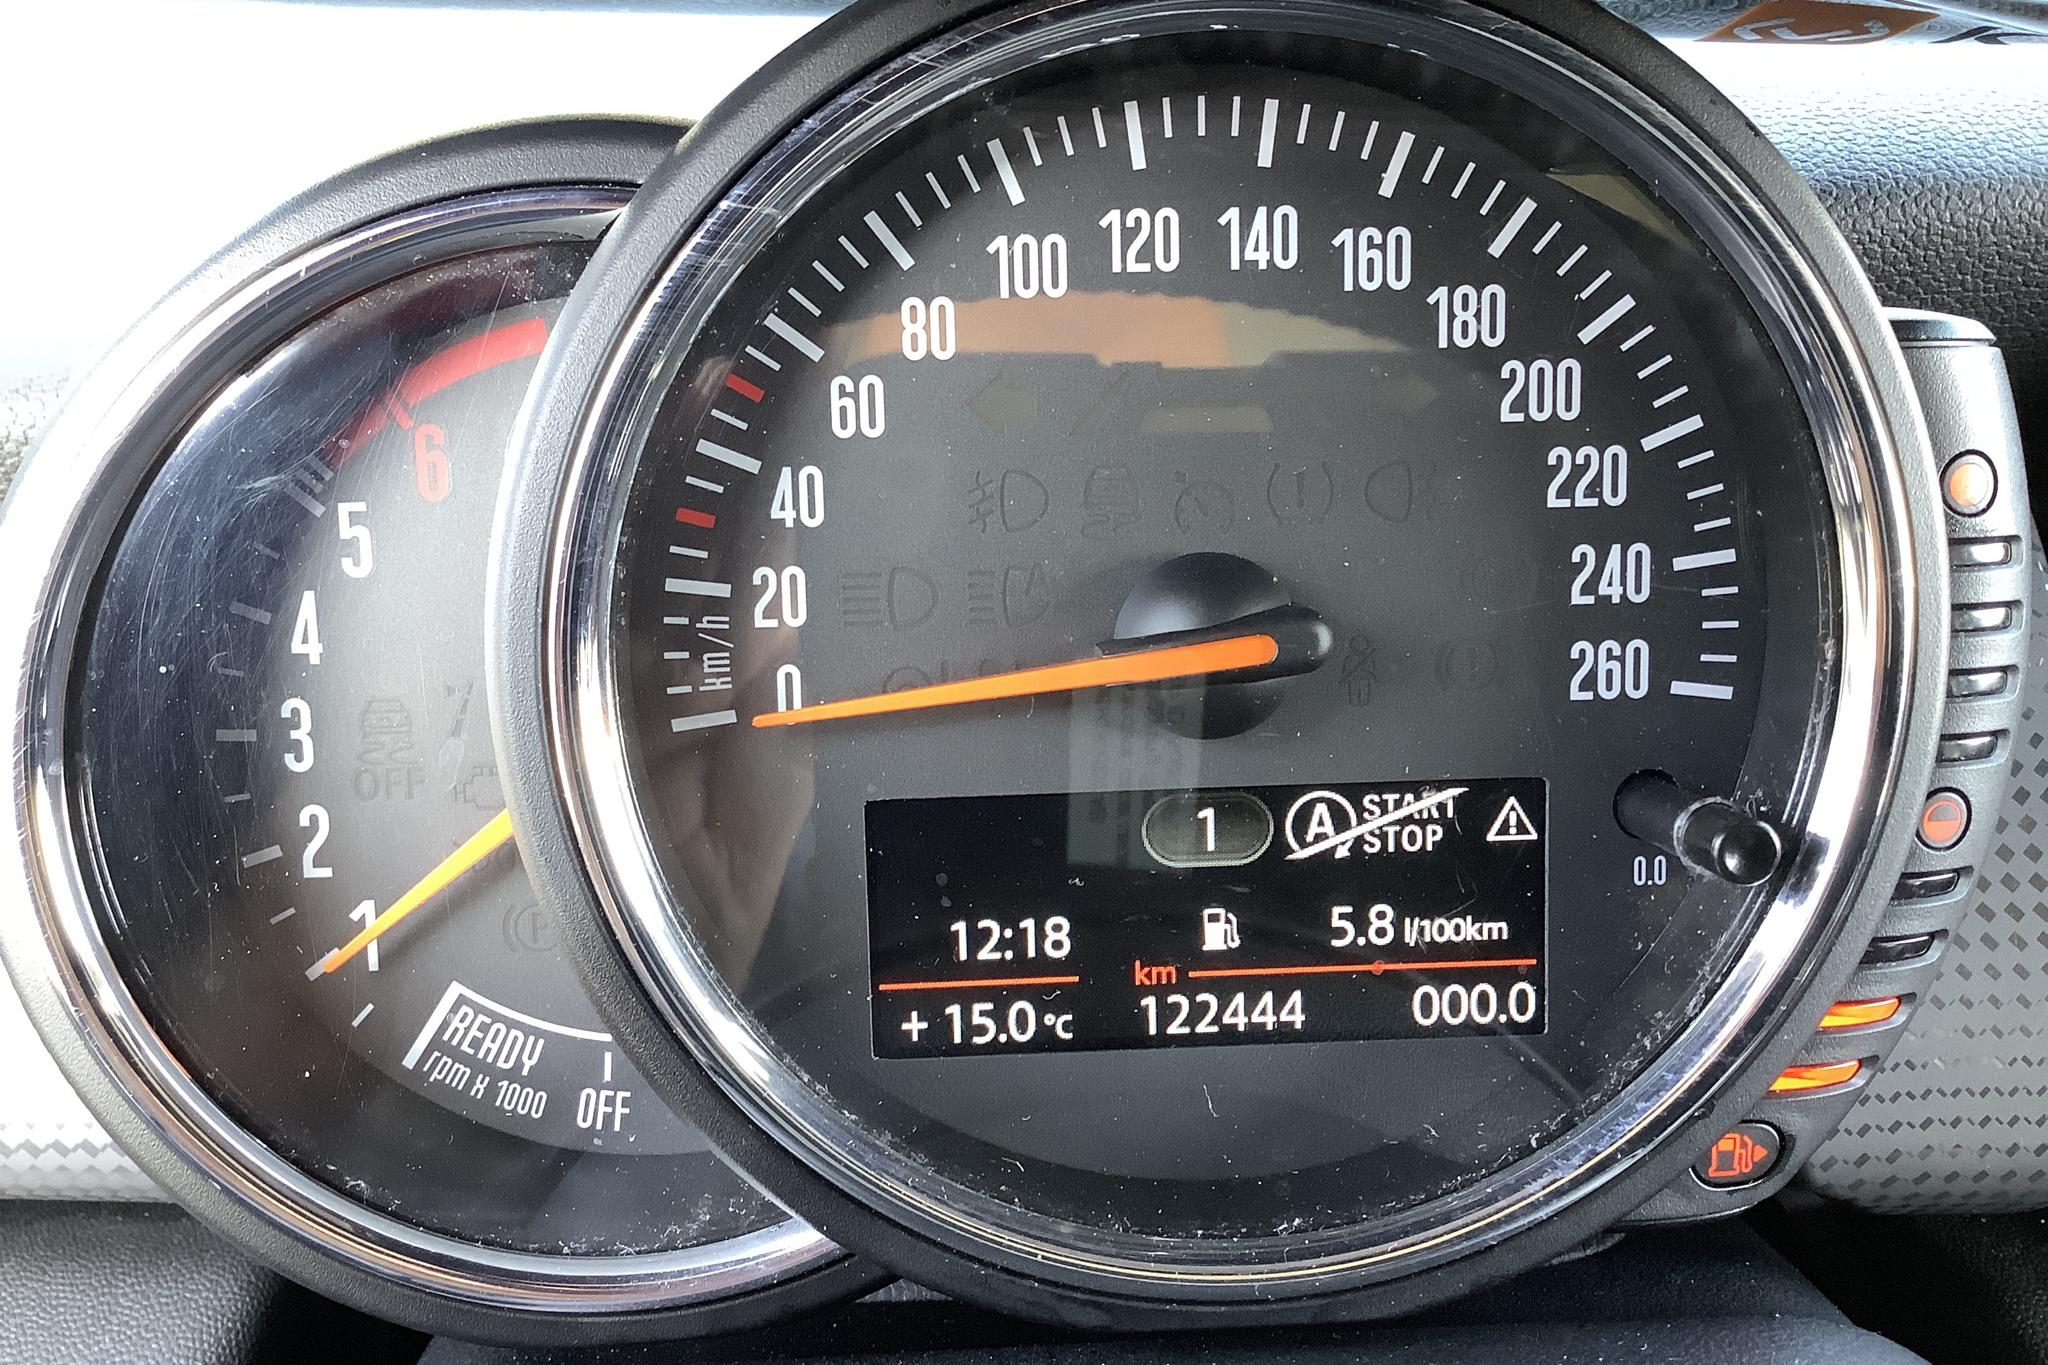 MINI One D Hatch 5dr (95hk) - 122 440 km - Manual - white - 2016